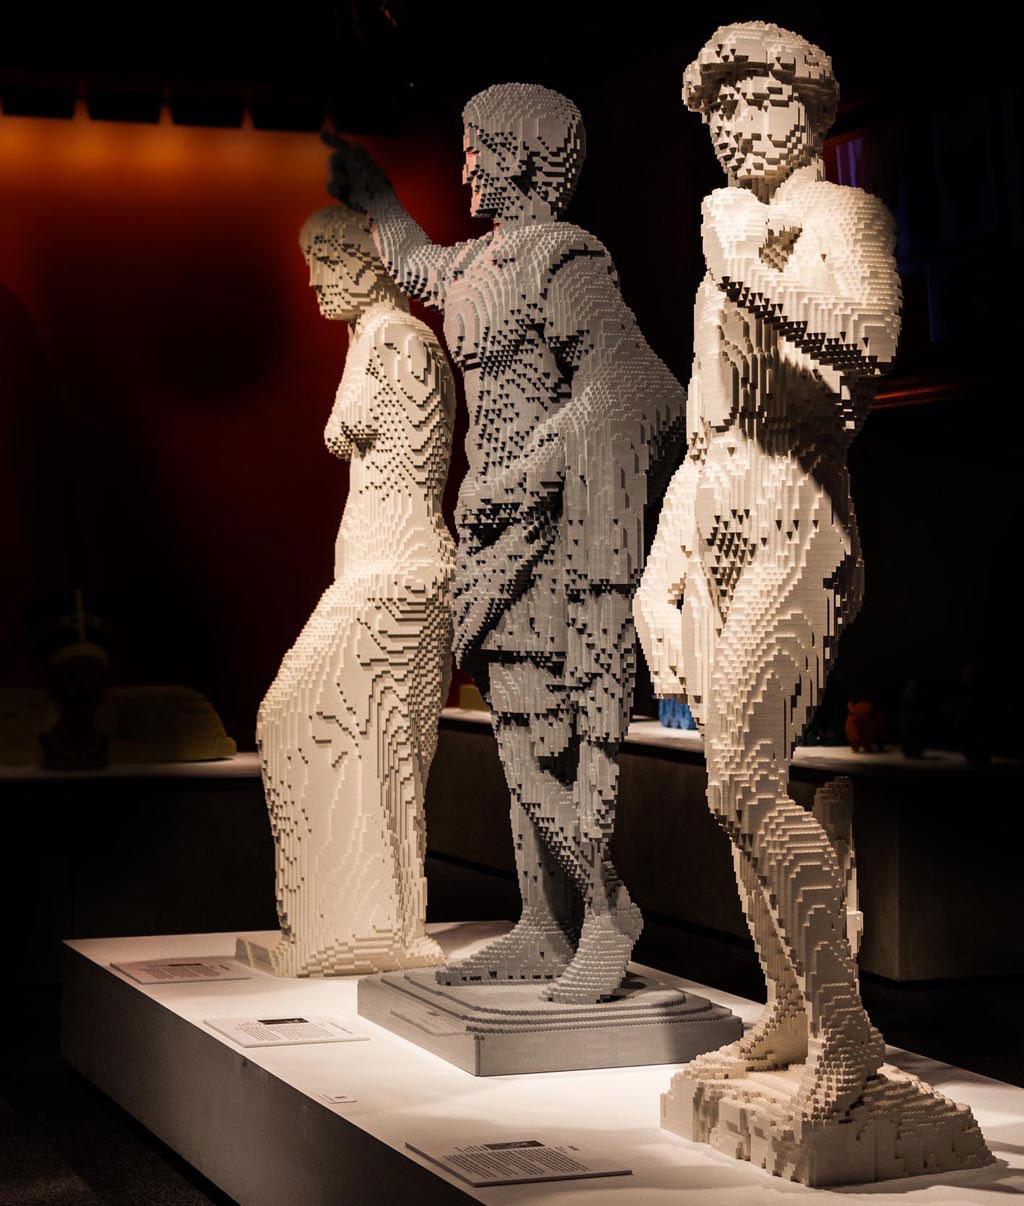 Nathan Sawaya: veduta della mostra The Art of the Brick, presso lo Spazio Set Tirso, al Salario, dal 28 ottobre al 14 febbraio.